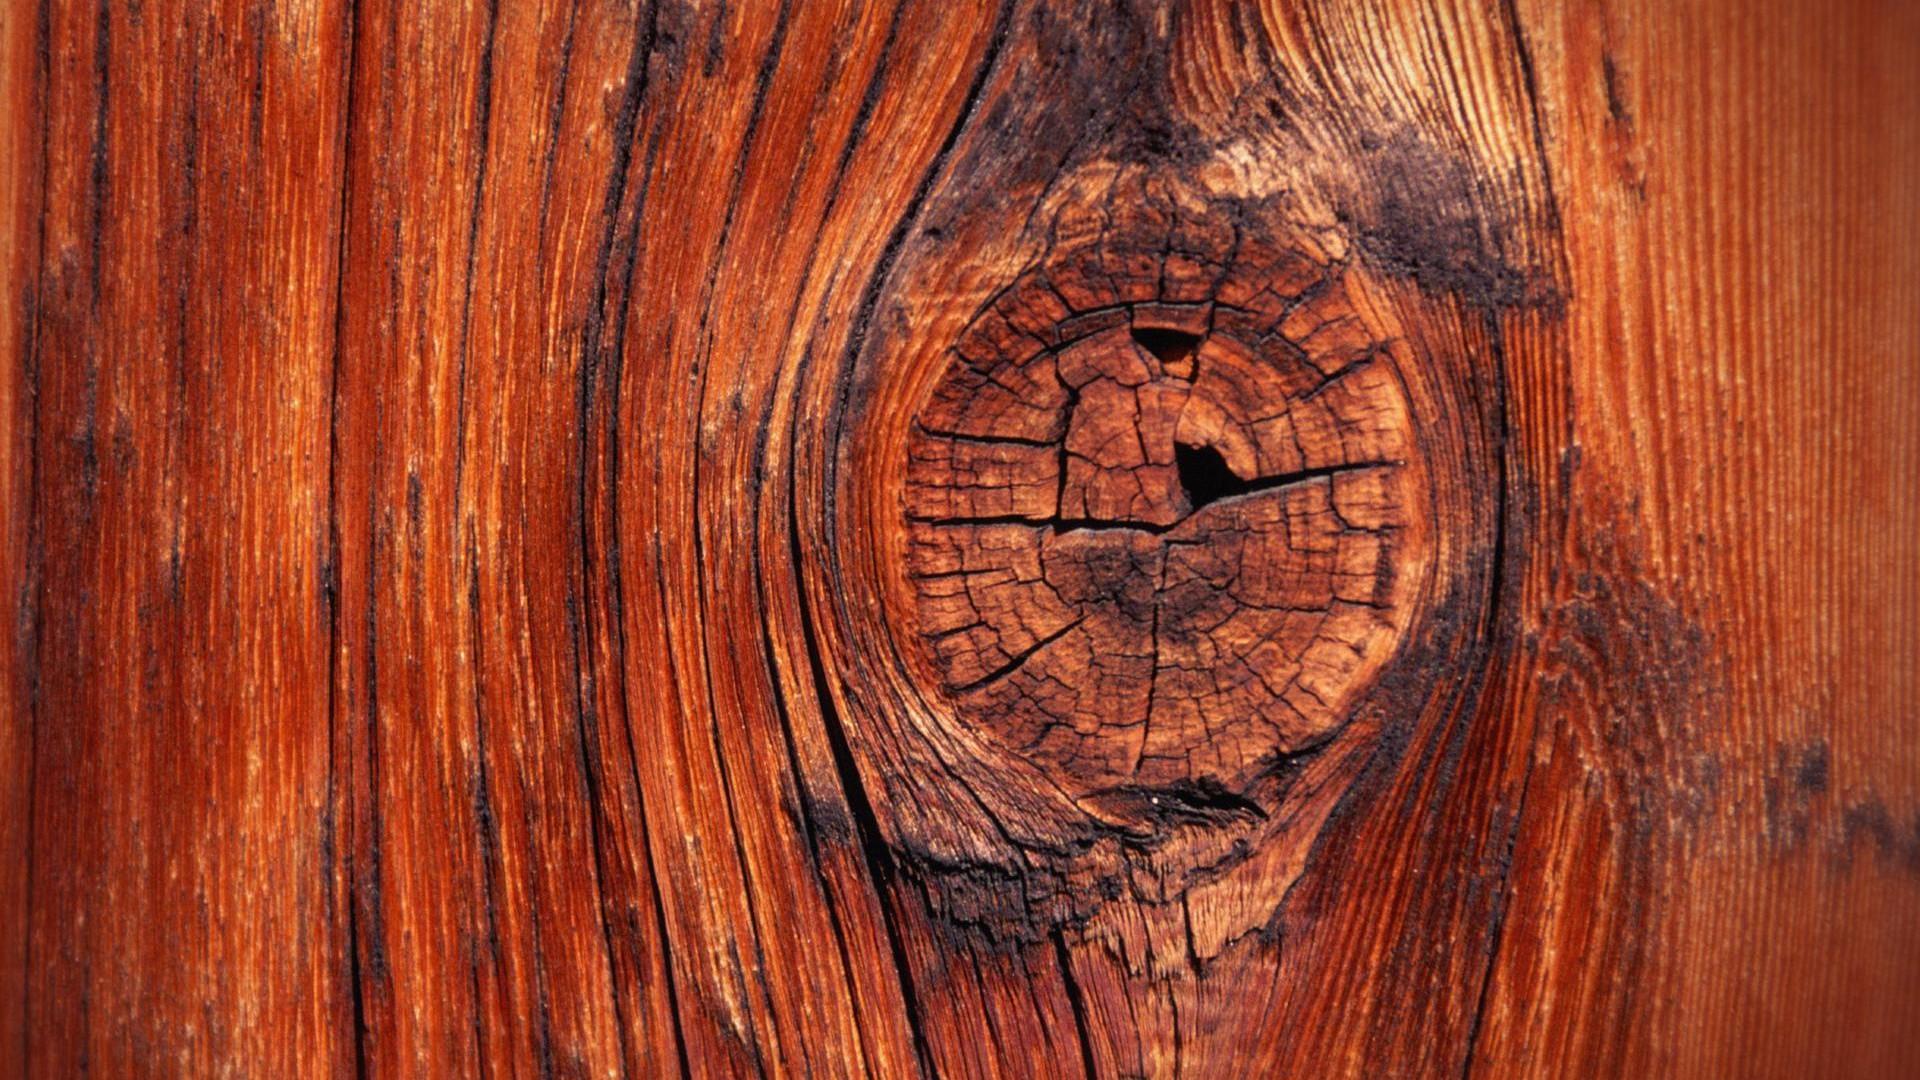 Wood grain desktop wallpaper 51 images 1920x1080 voltagebd Choice Image